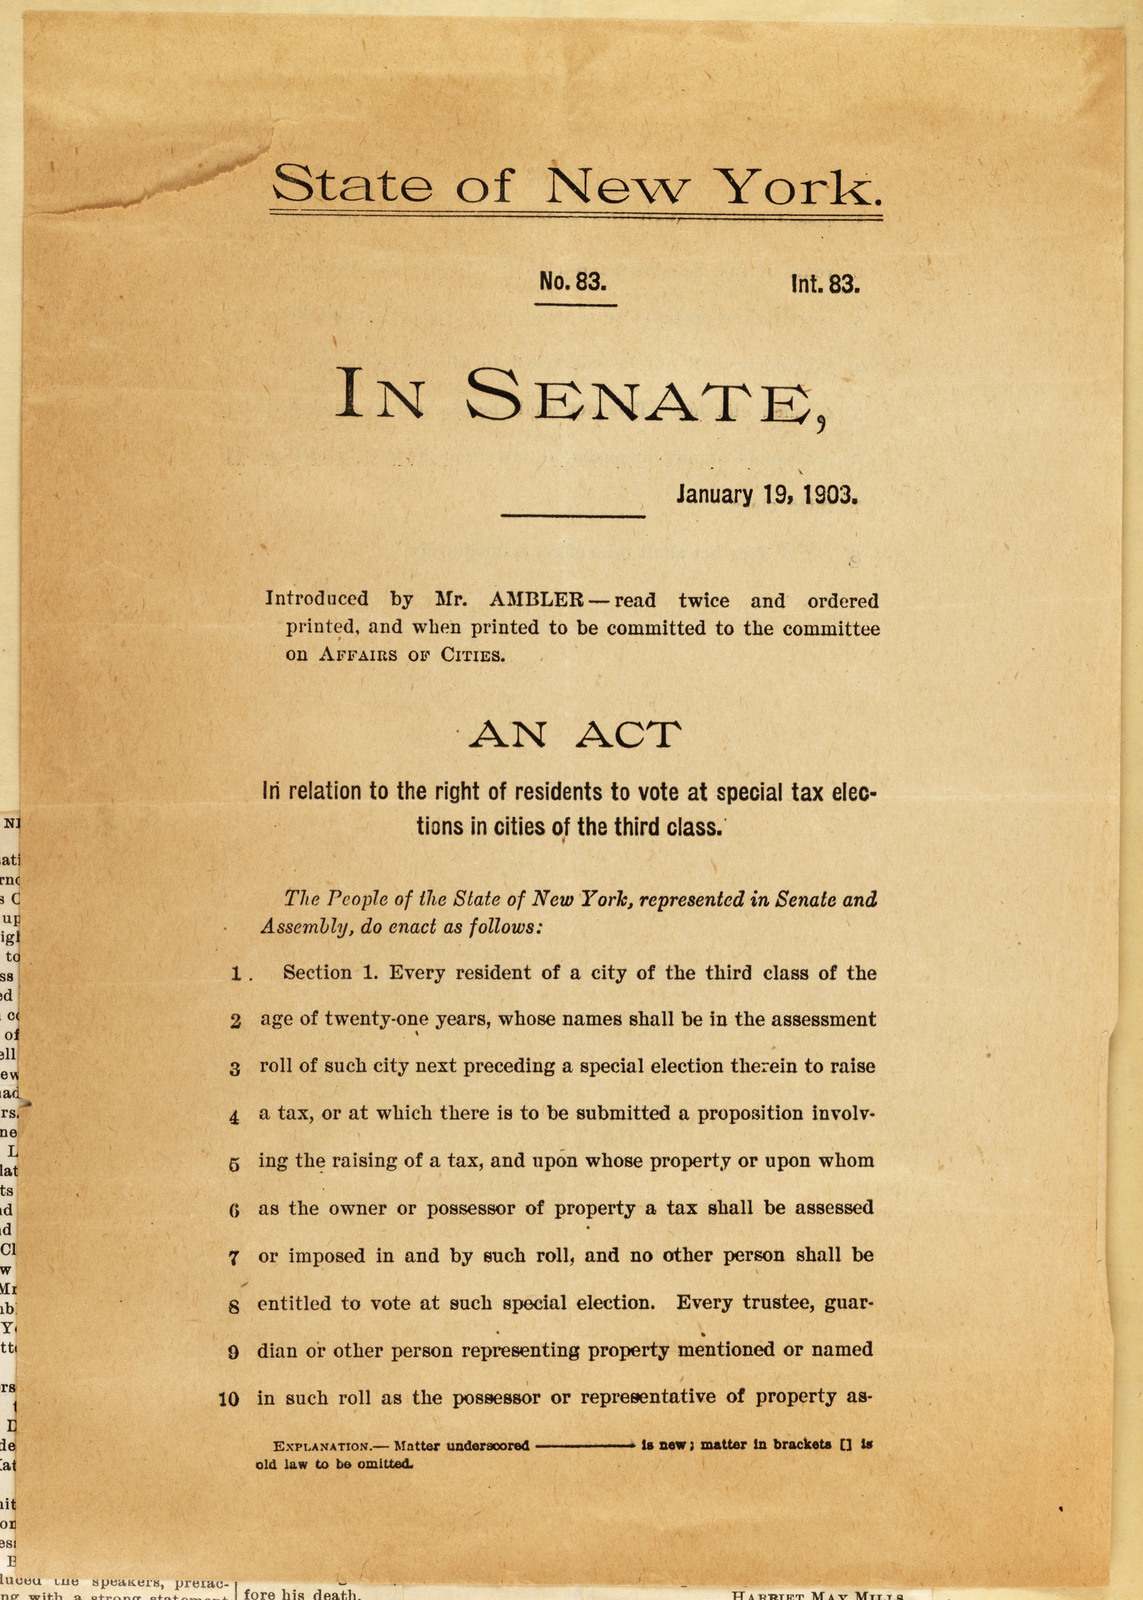 Legislative Committee of New York State Woman Suffrage Association to New York Legislature